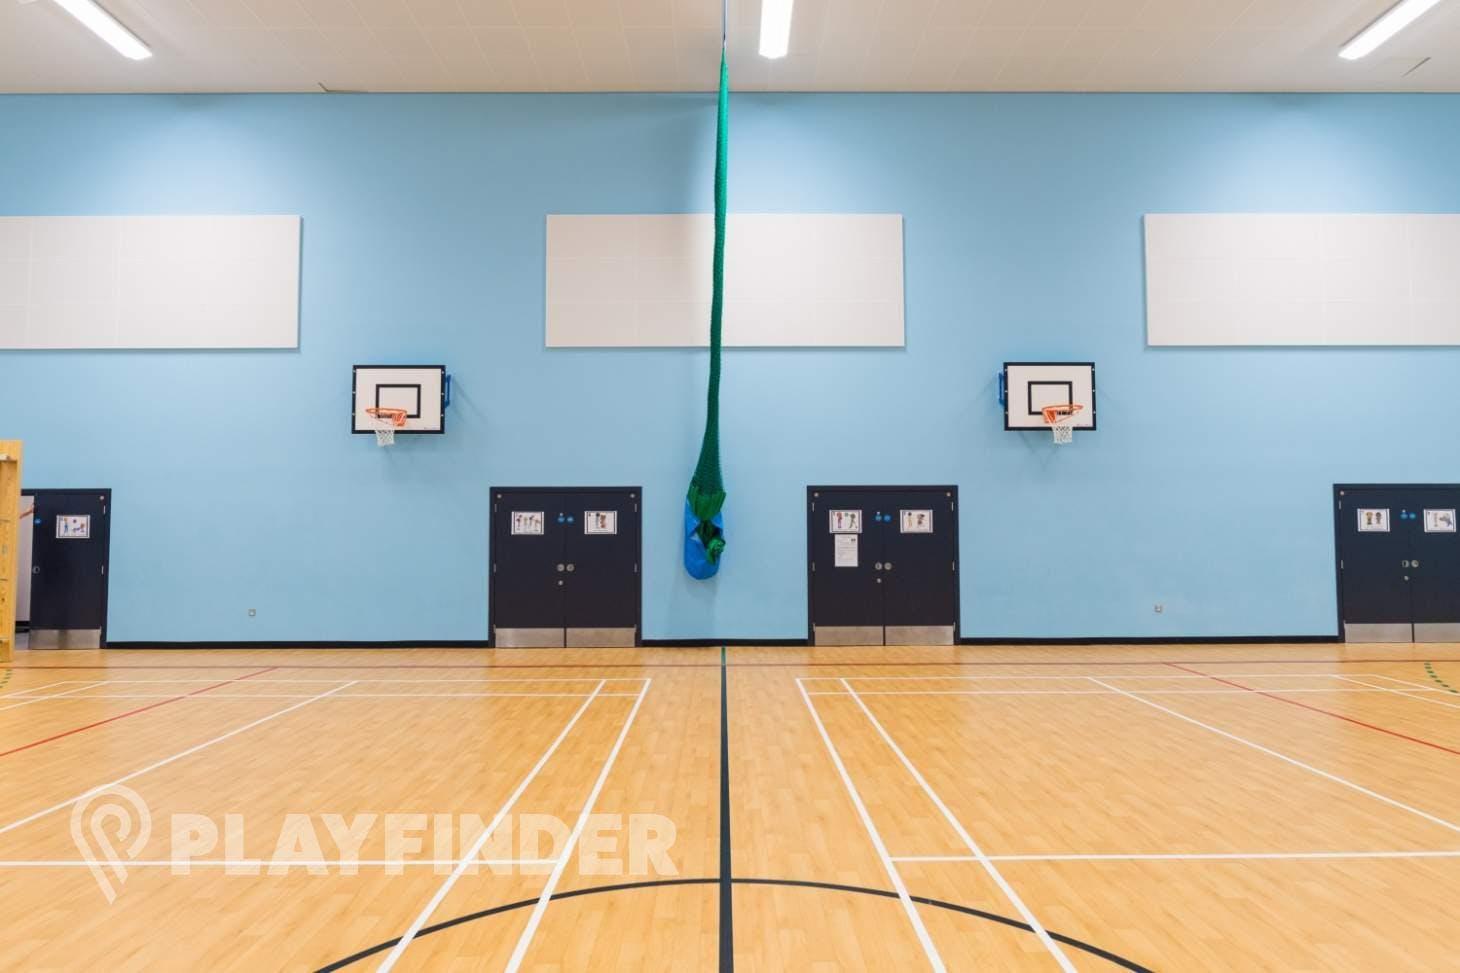 Manchester Enterprise Academy Central Court | Sports hall netball court